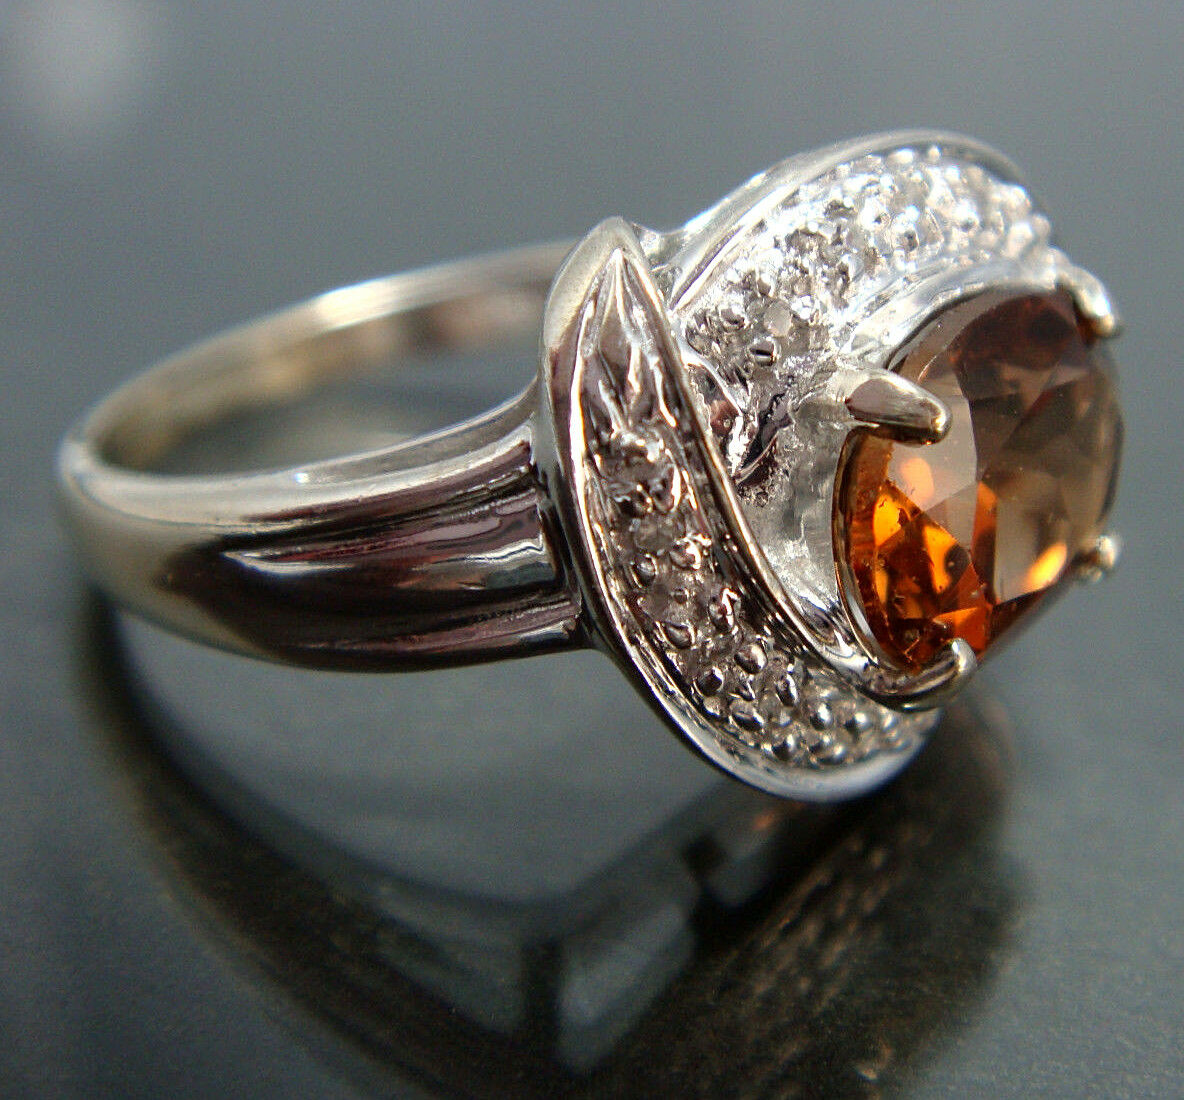 Genuine Precious Imperial Topaz & Diamond Halo 14k White gold Ring 4.7g Size 8